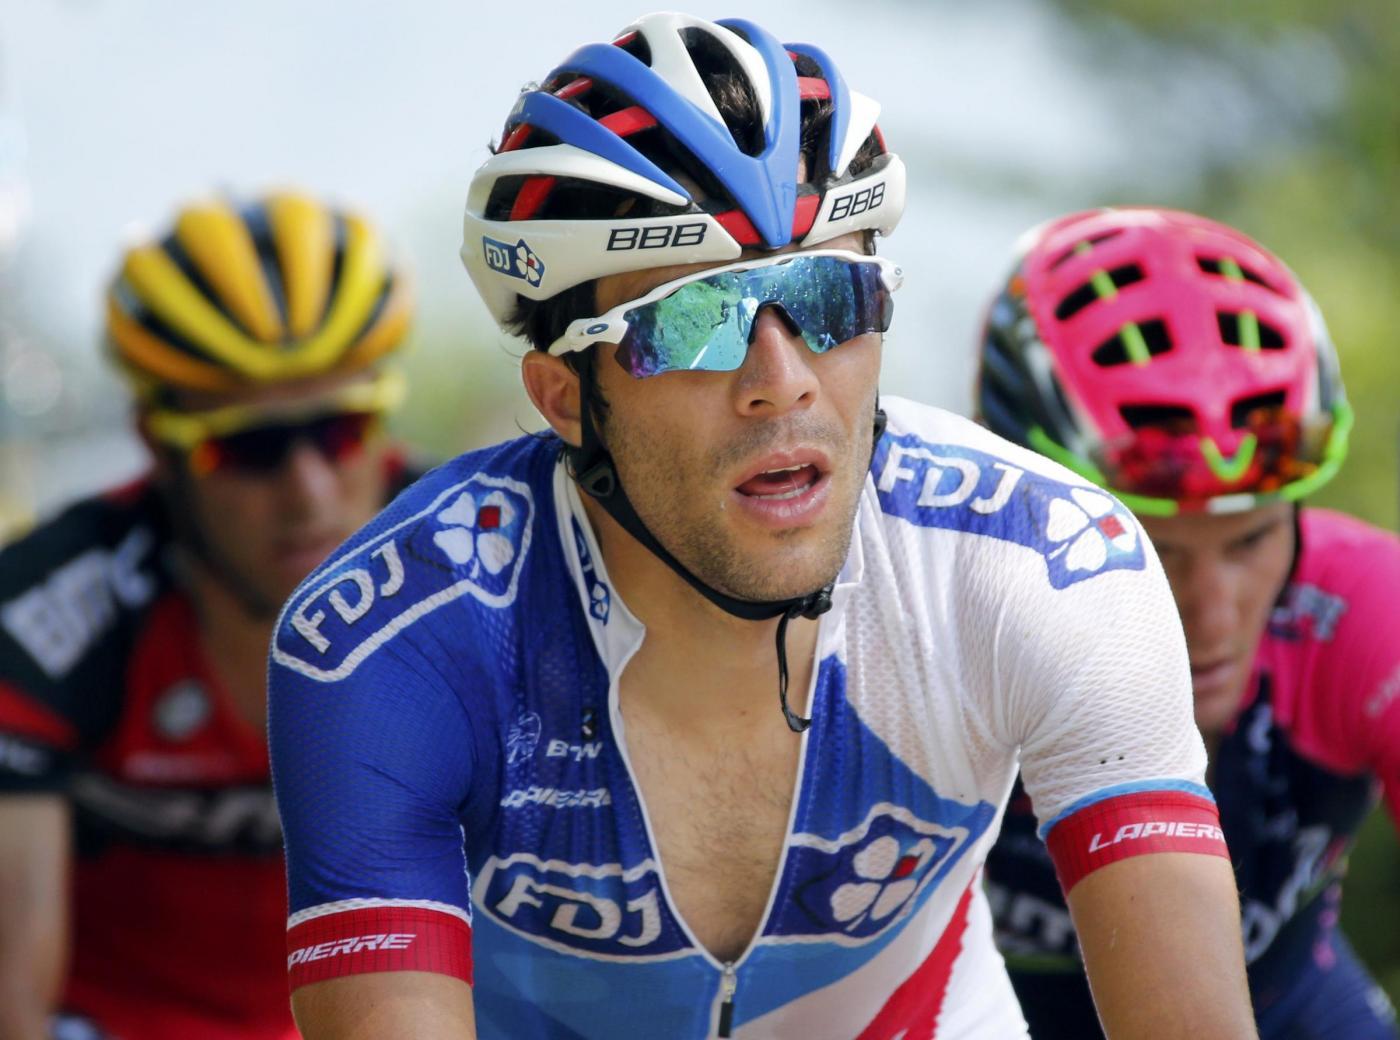 Tour de France 2017. Richie Porte e Geraint Thomas, la maledizione continua